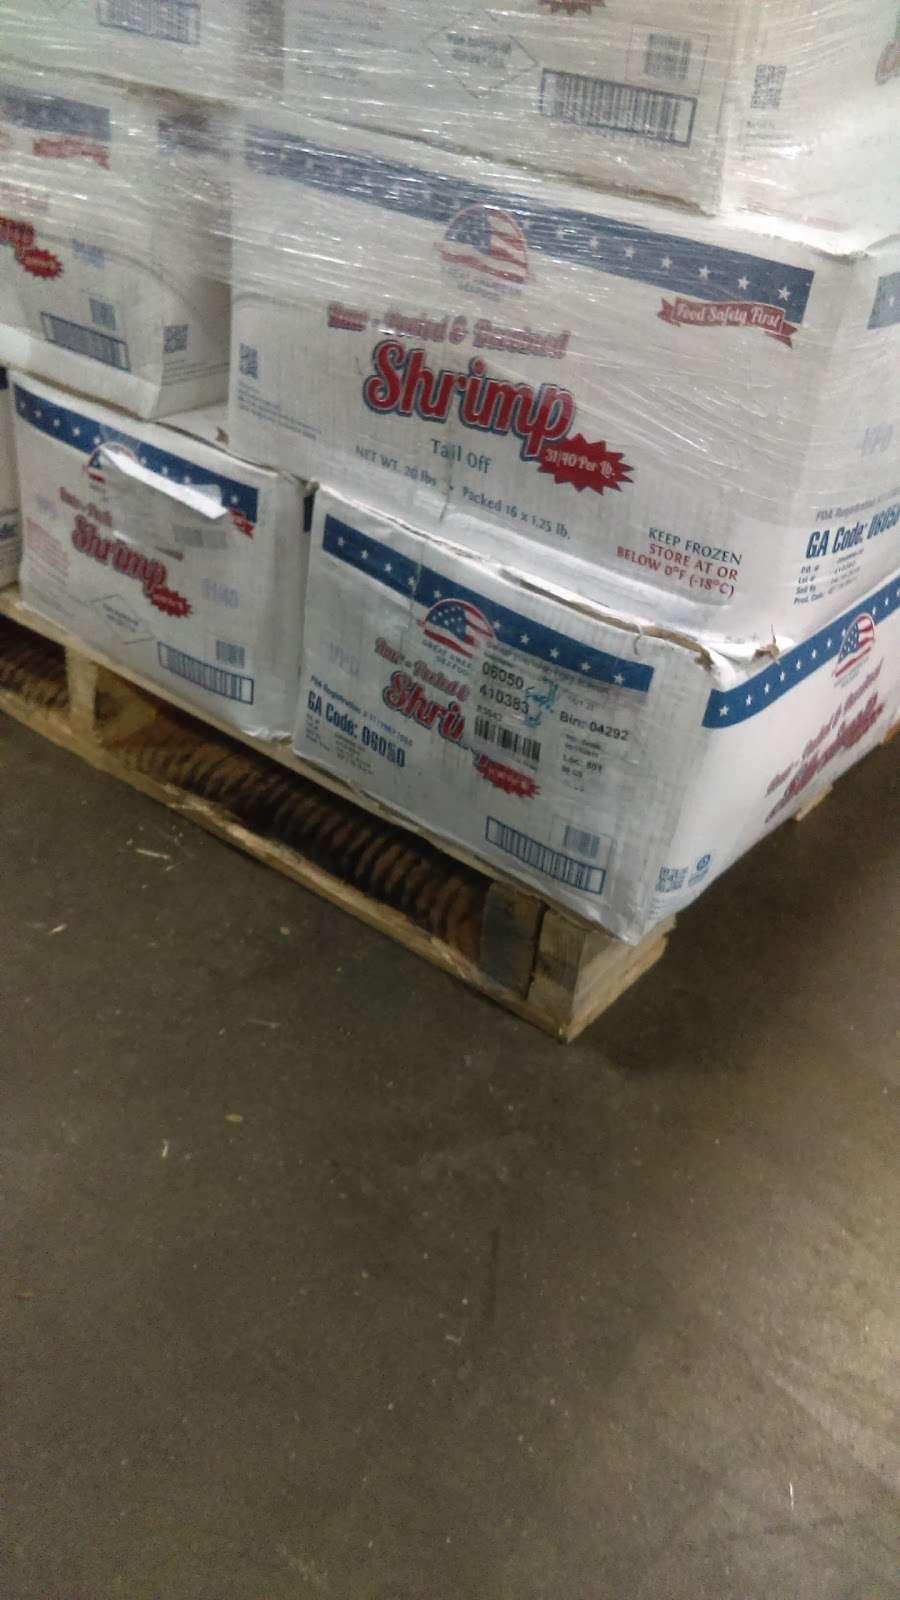 Roundys Supermarkets Distribution Warehouse - storage  | Photo 7 of 10 | Address: 1120 Distribution Ct, Oconomowoc, WI 53066, USA | Phone: (262) 560-3300